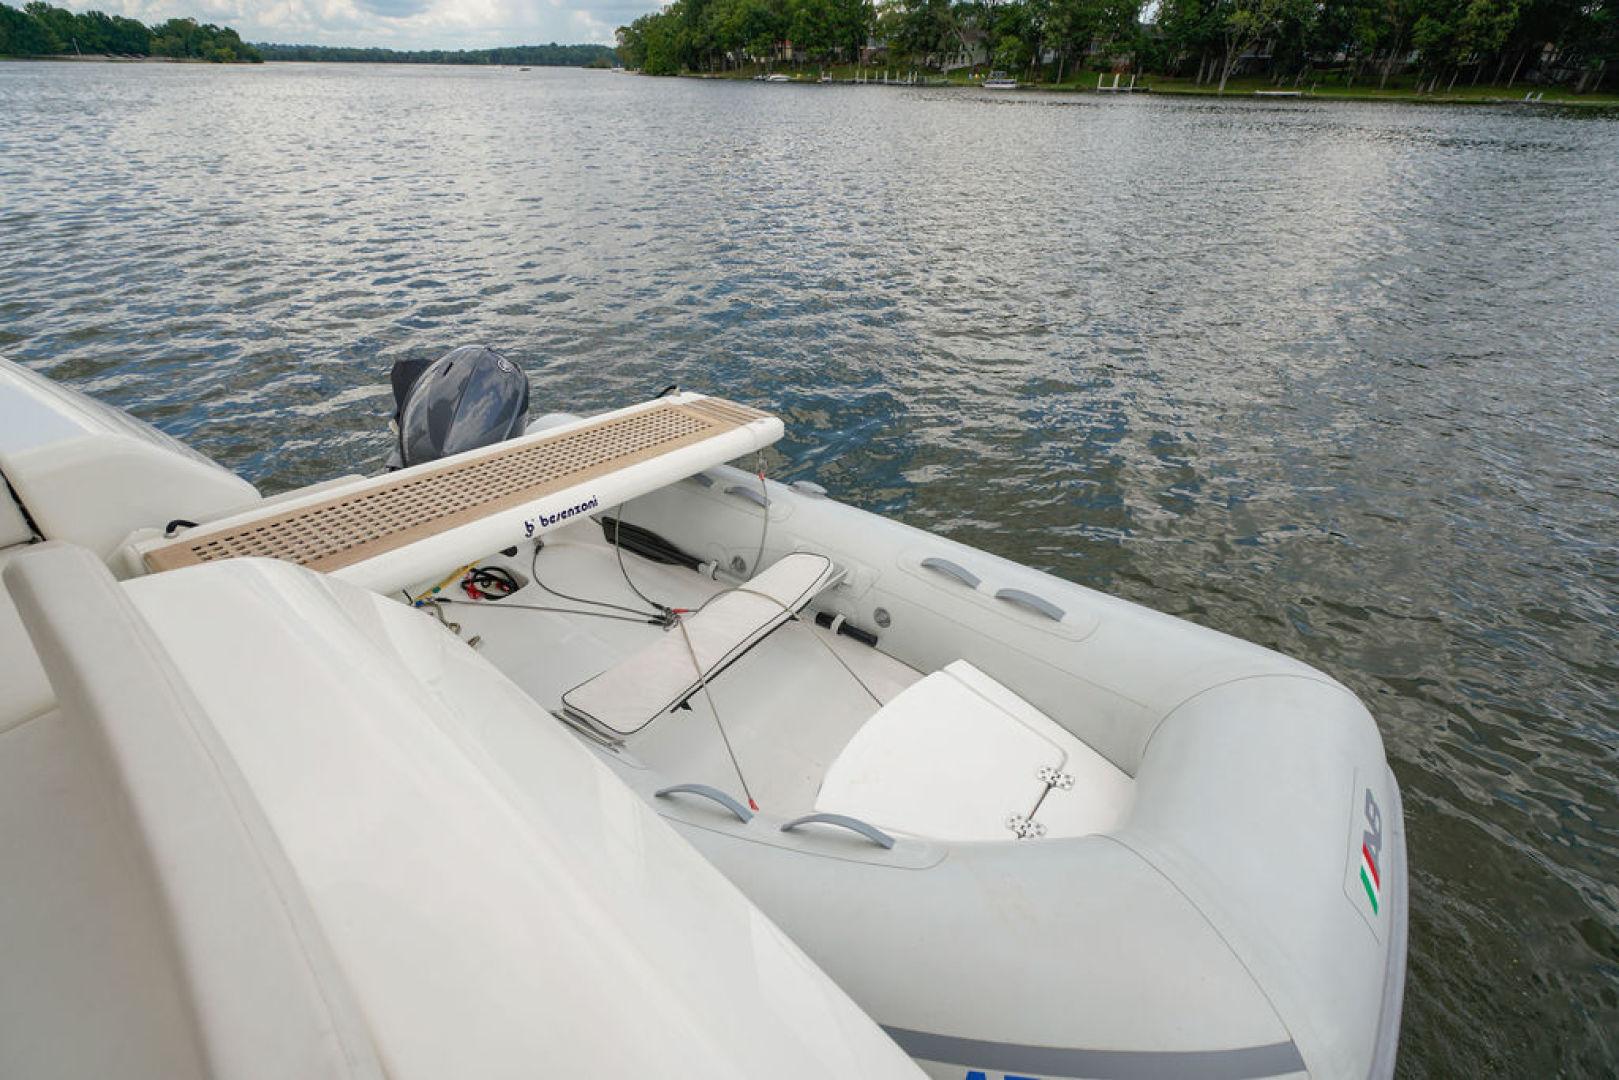 Ferretti Yachts-530 2013-ISLAND GIRL Mount Juliet-Tennessee-United States-1574691   Thumbnail